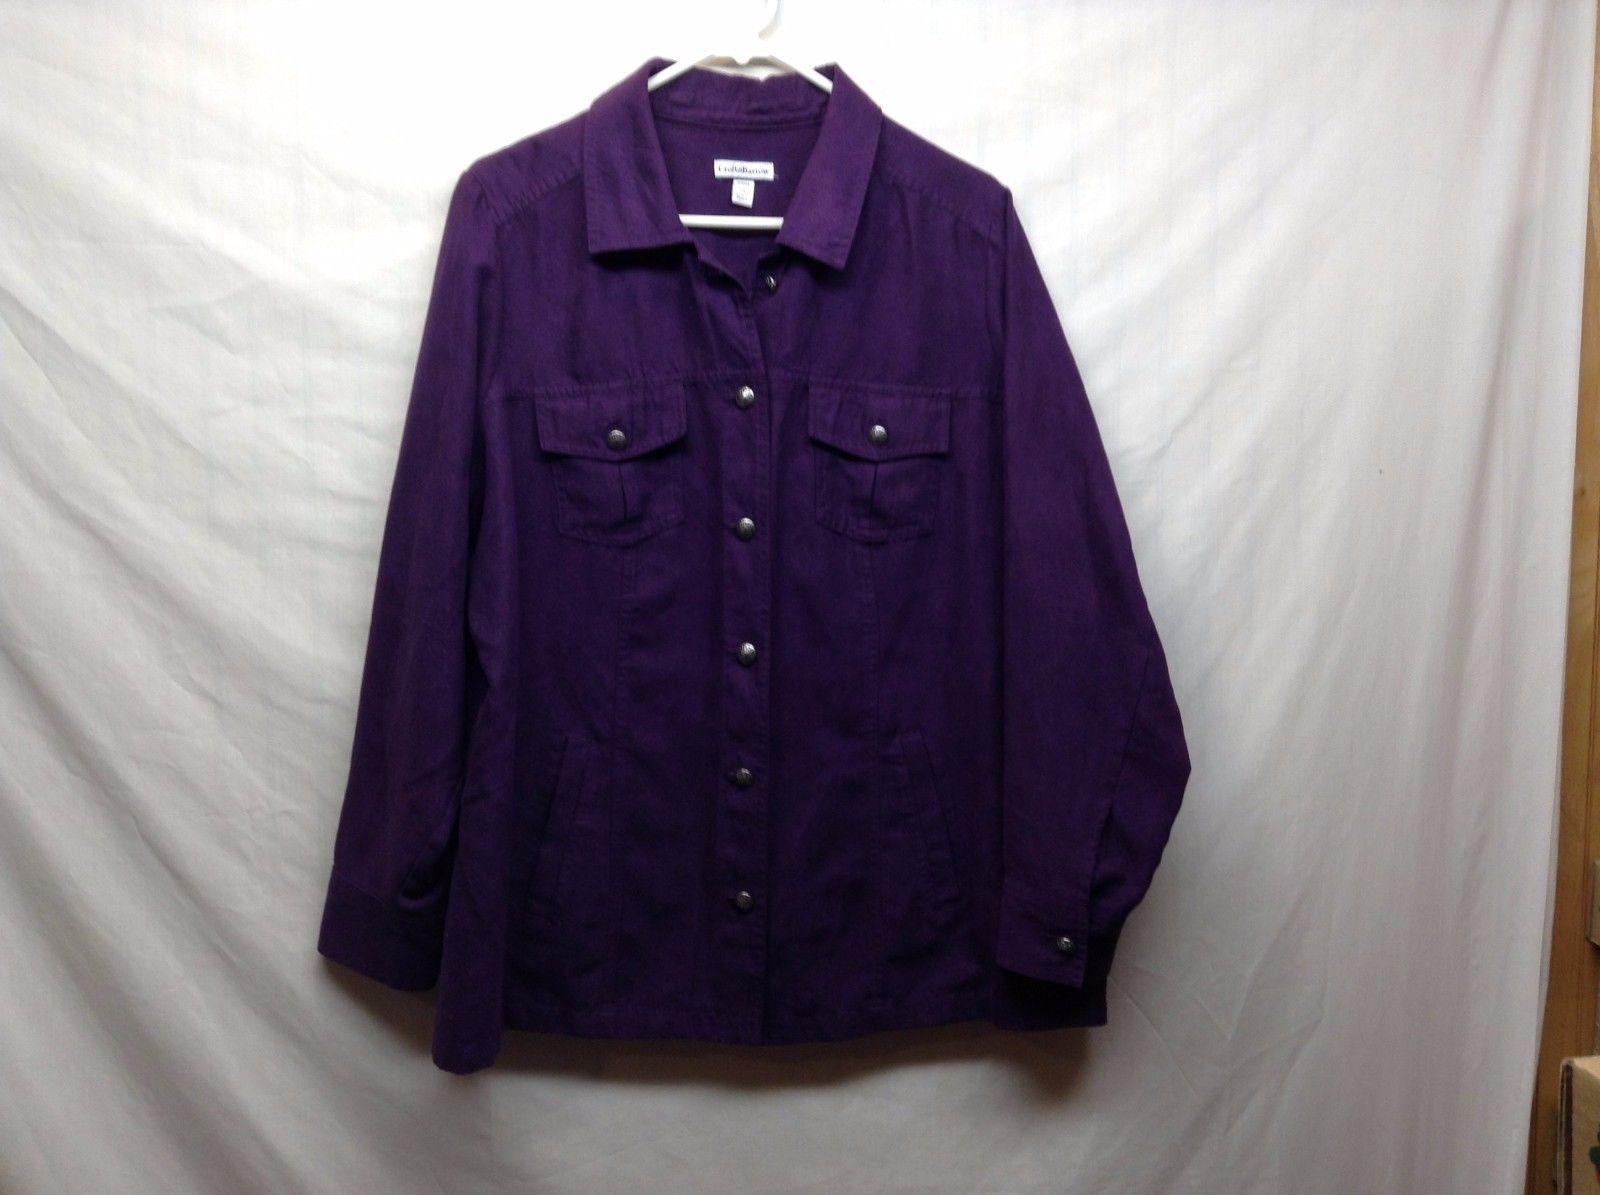 Croft & Barrow Deep Purple Button Up Collared Shirt Sz 1X